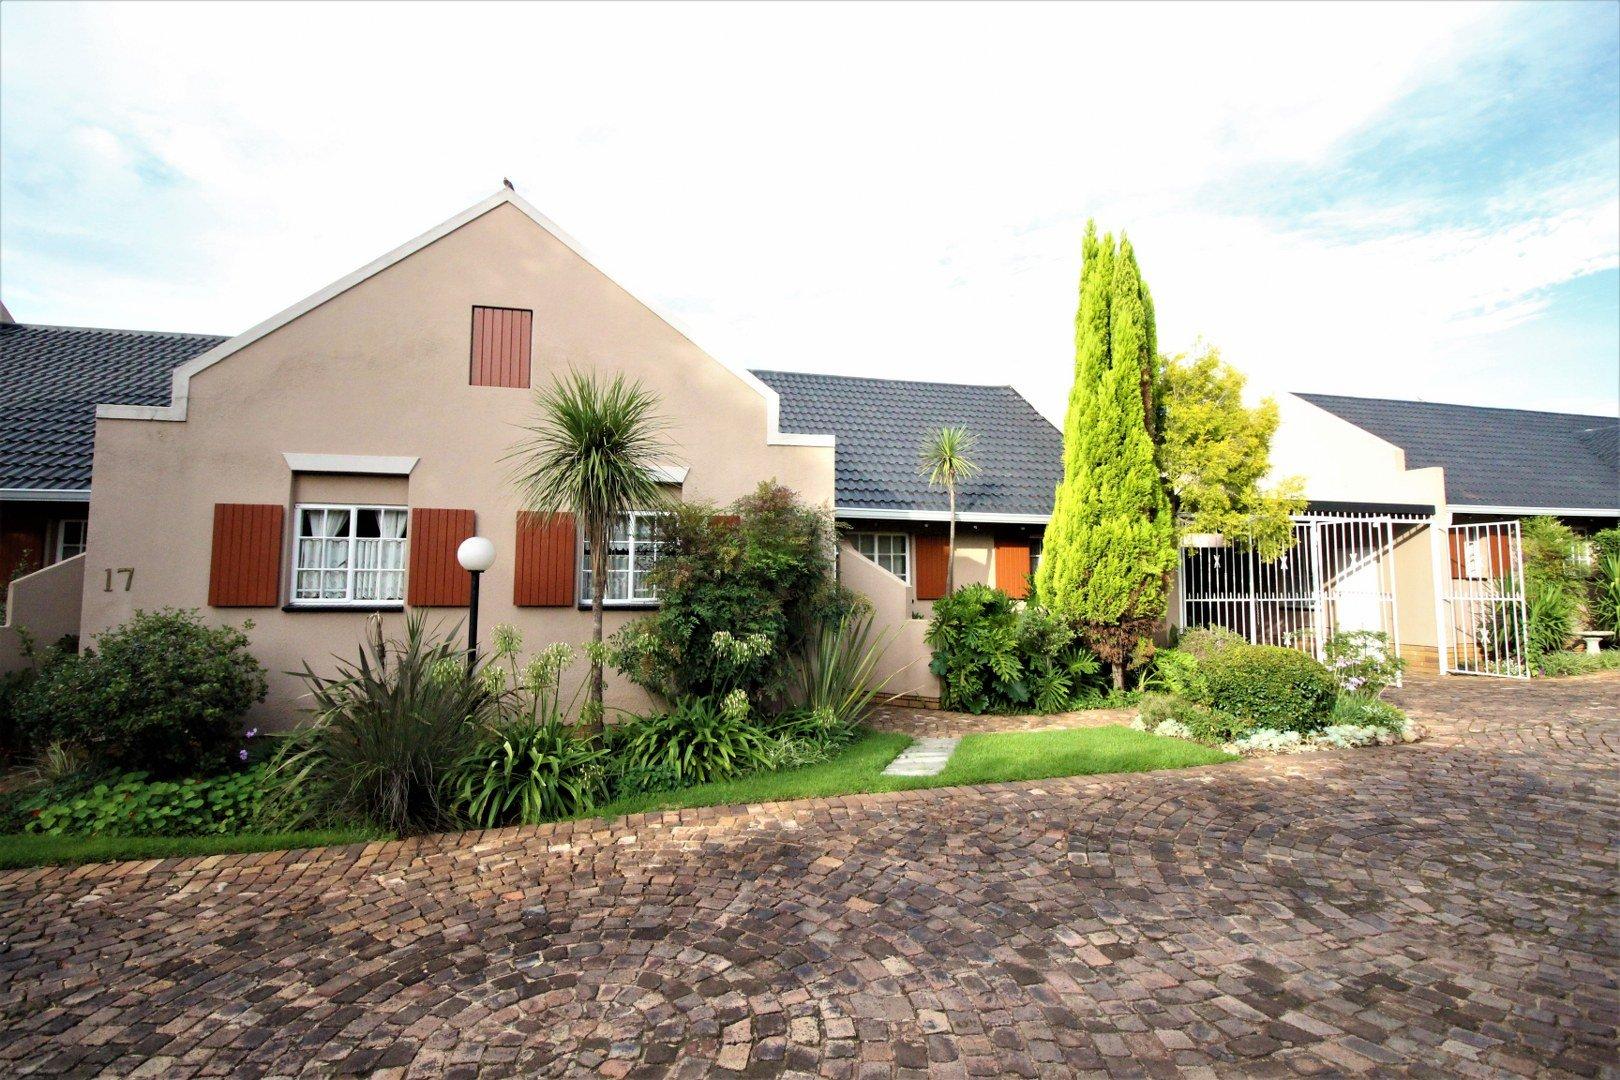 Property for Sale by Angelique De Amaral, Townhouse, 2 Bedrooms - ZAR 840,000